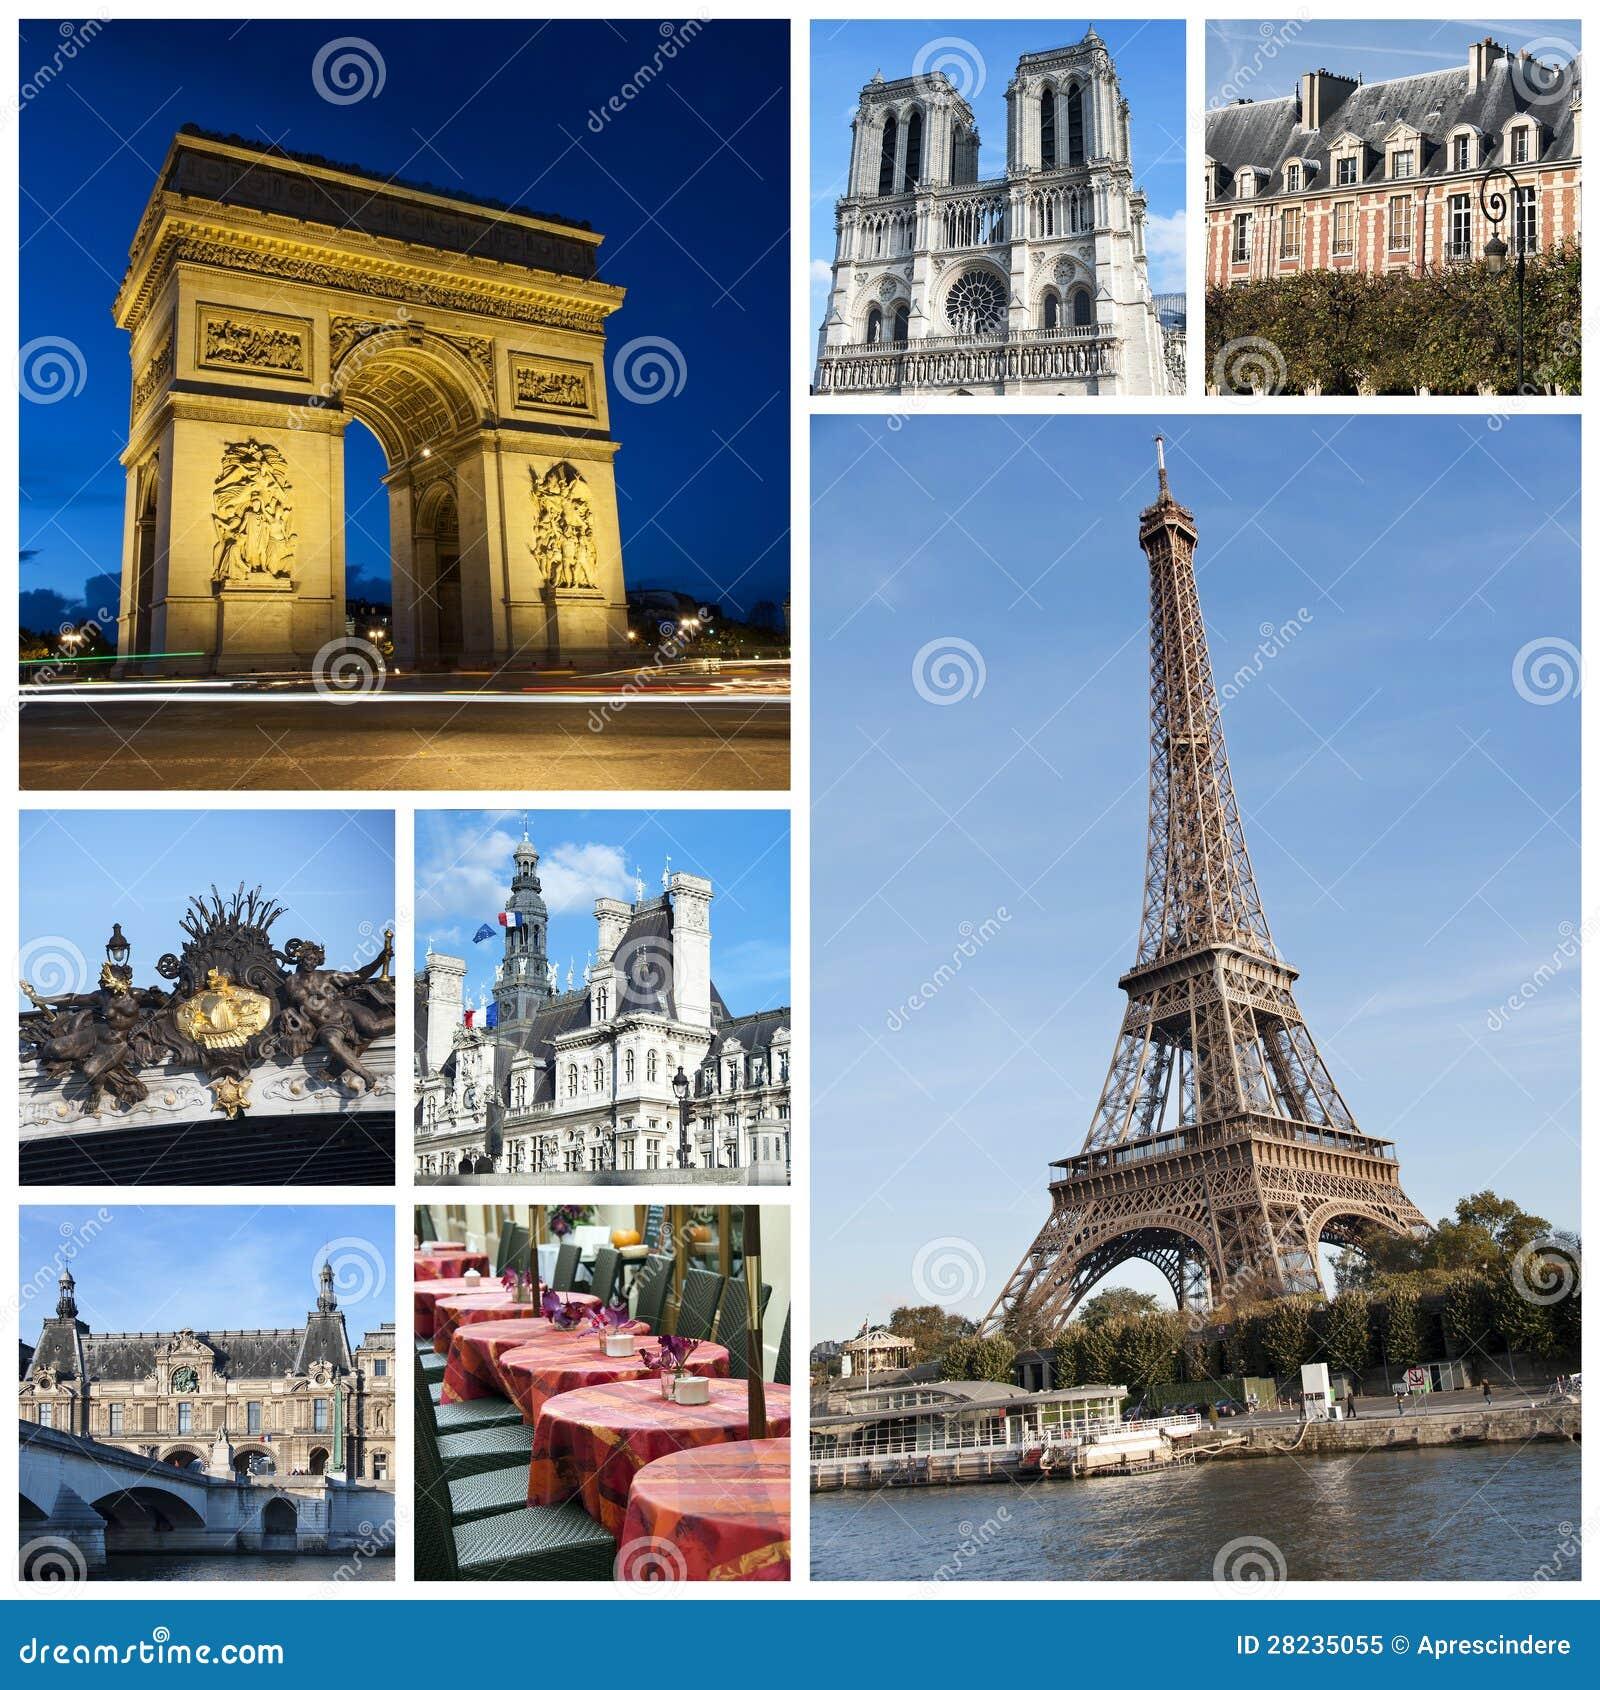 Postcards from paris c 1900 1920 10